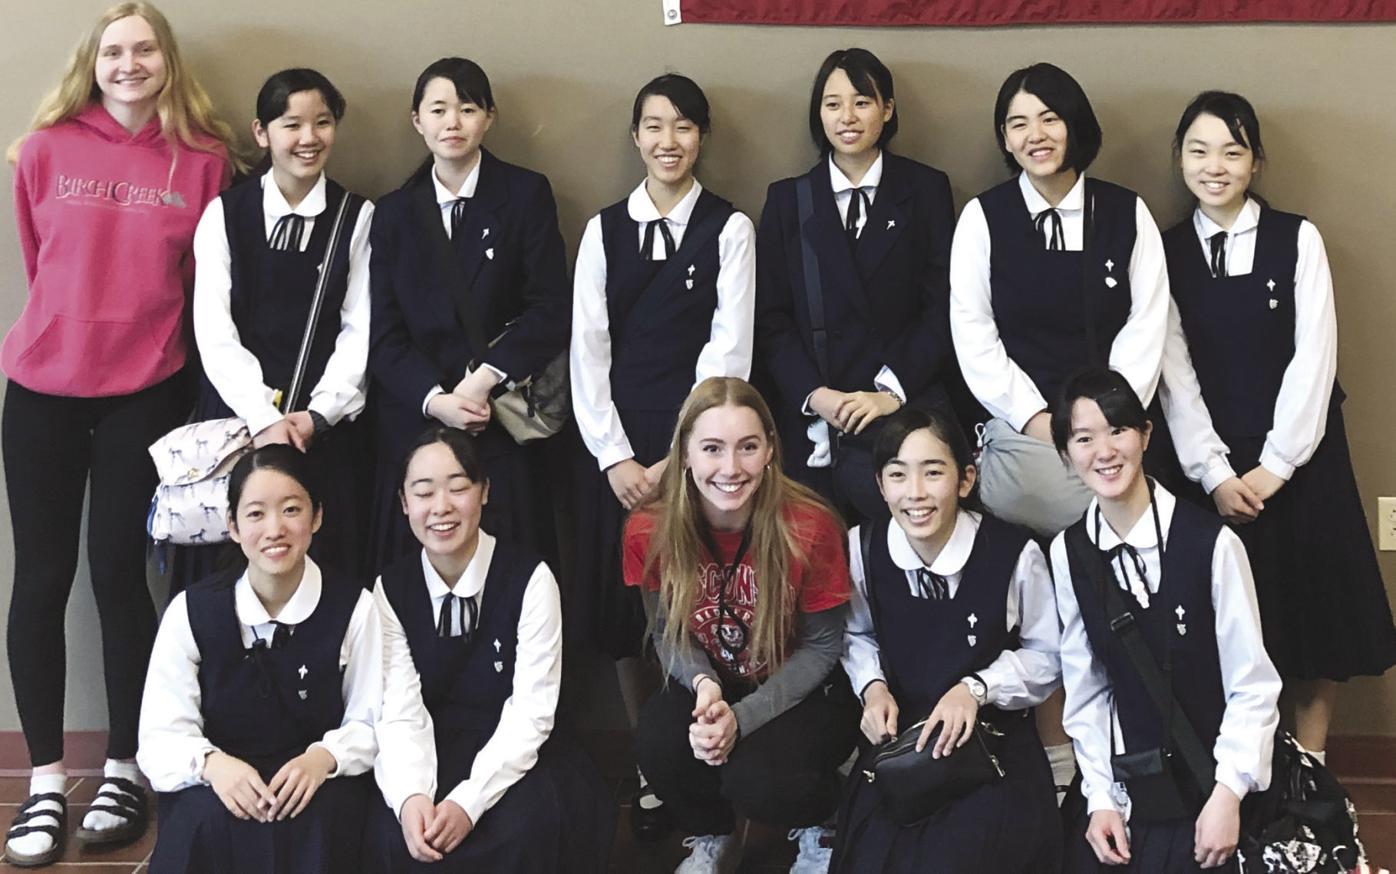 Hikarigaoka All Girls High School students from Japan make a lasting impression